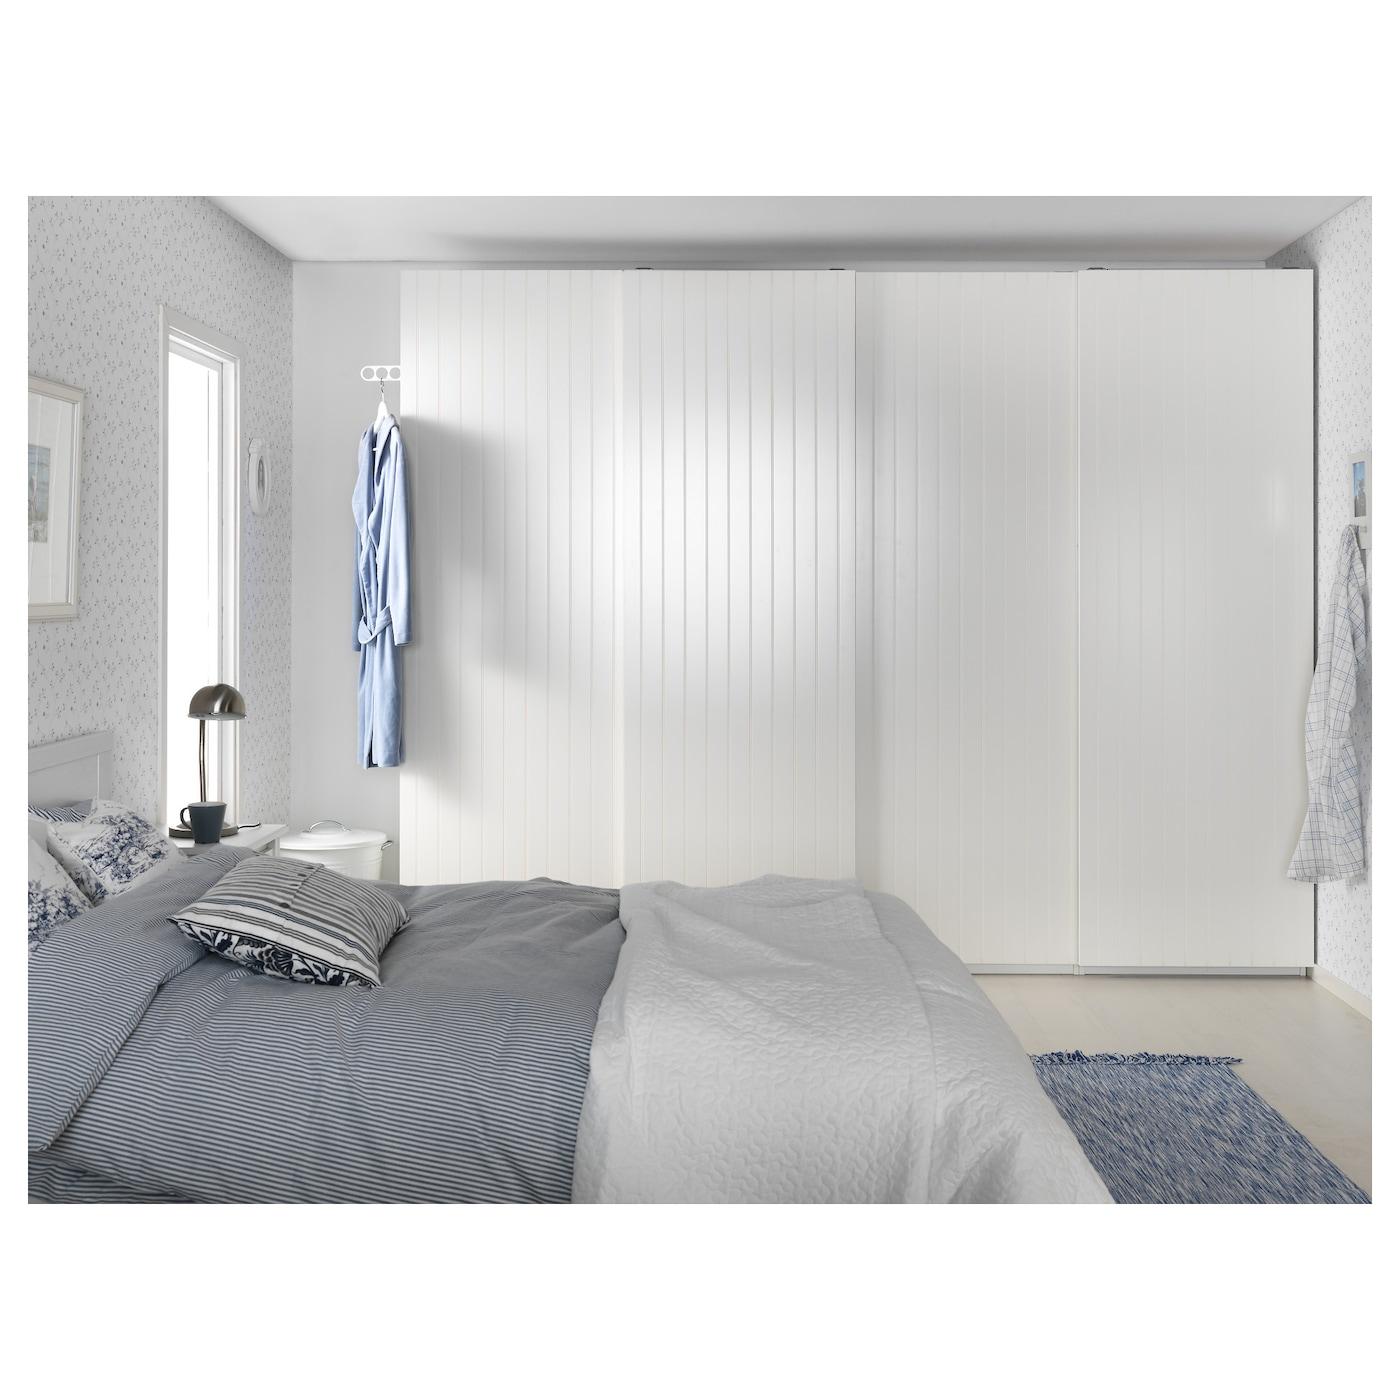 IKEA BERGSFJORD pair of sliding doors  sc 1 st  Ikea & BERGSFJORD Pair of sliding doors White 150x236 cm - IKEA pezcame.com